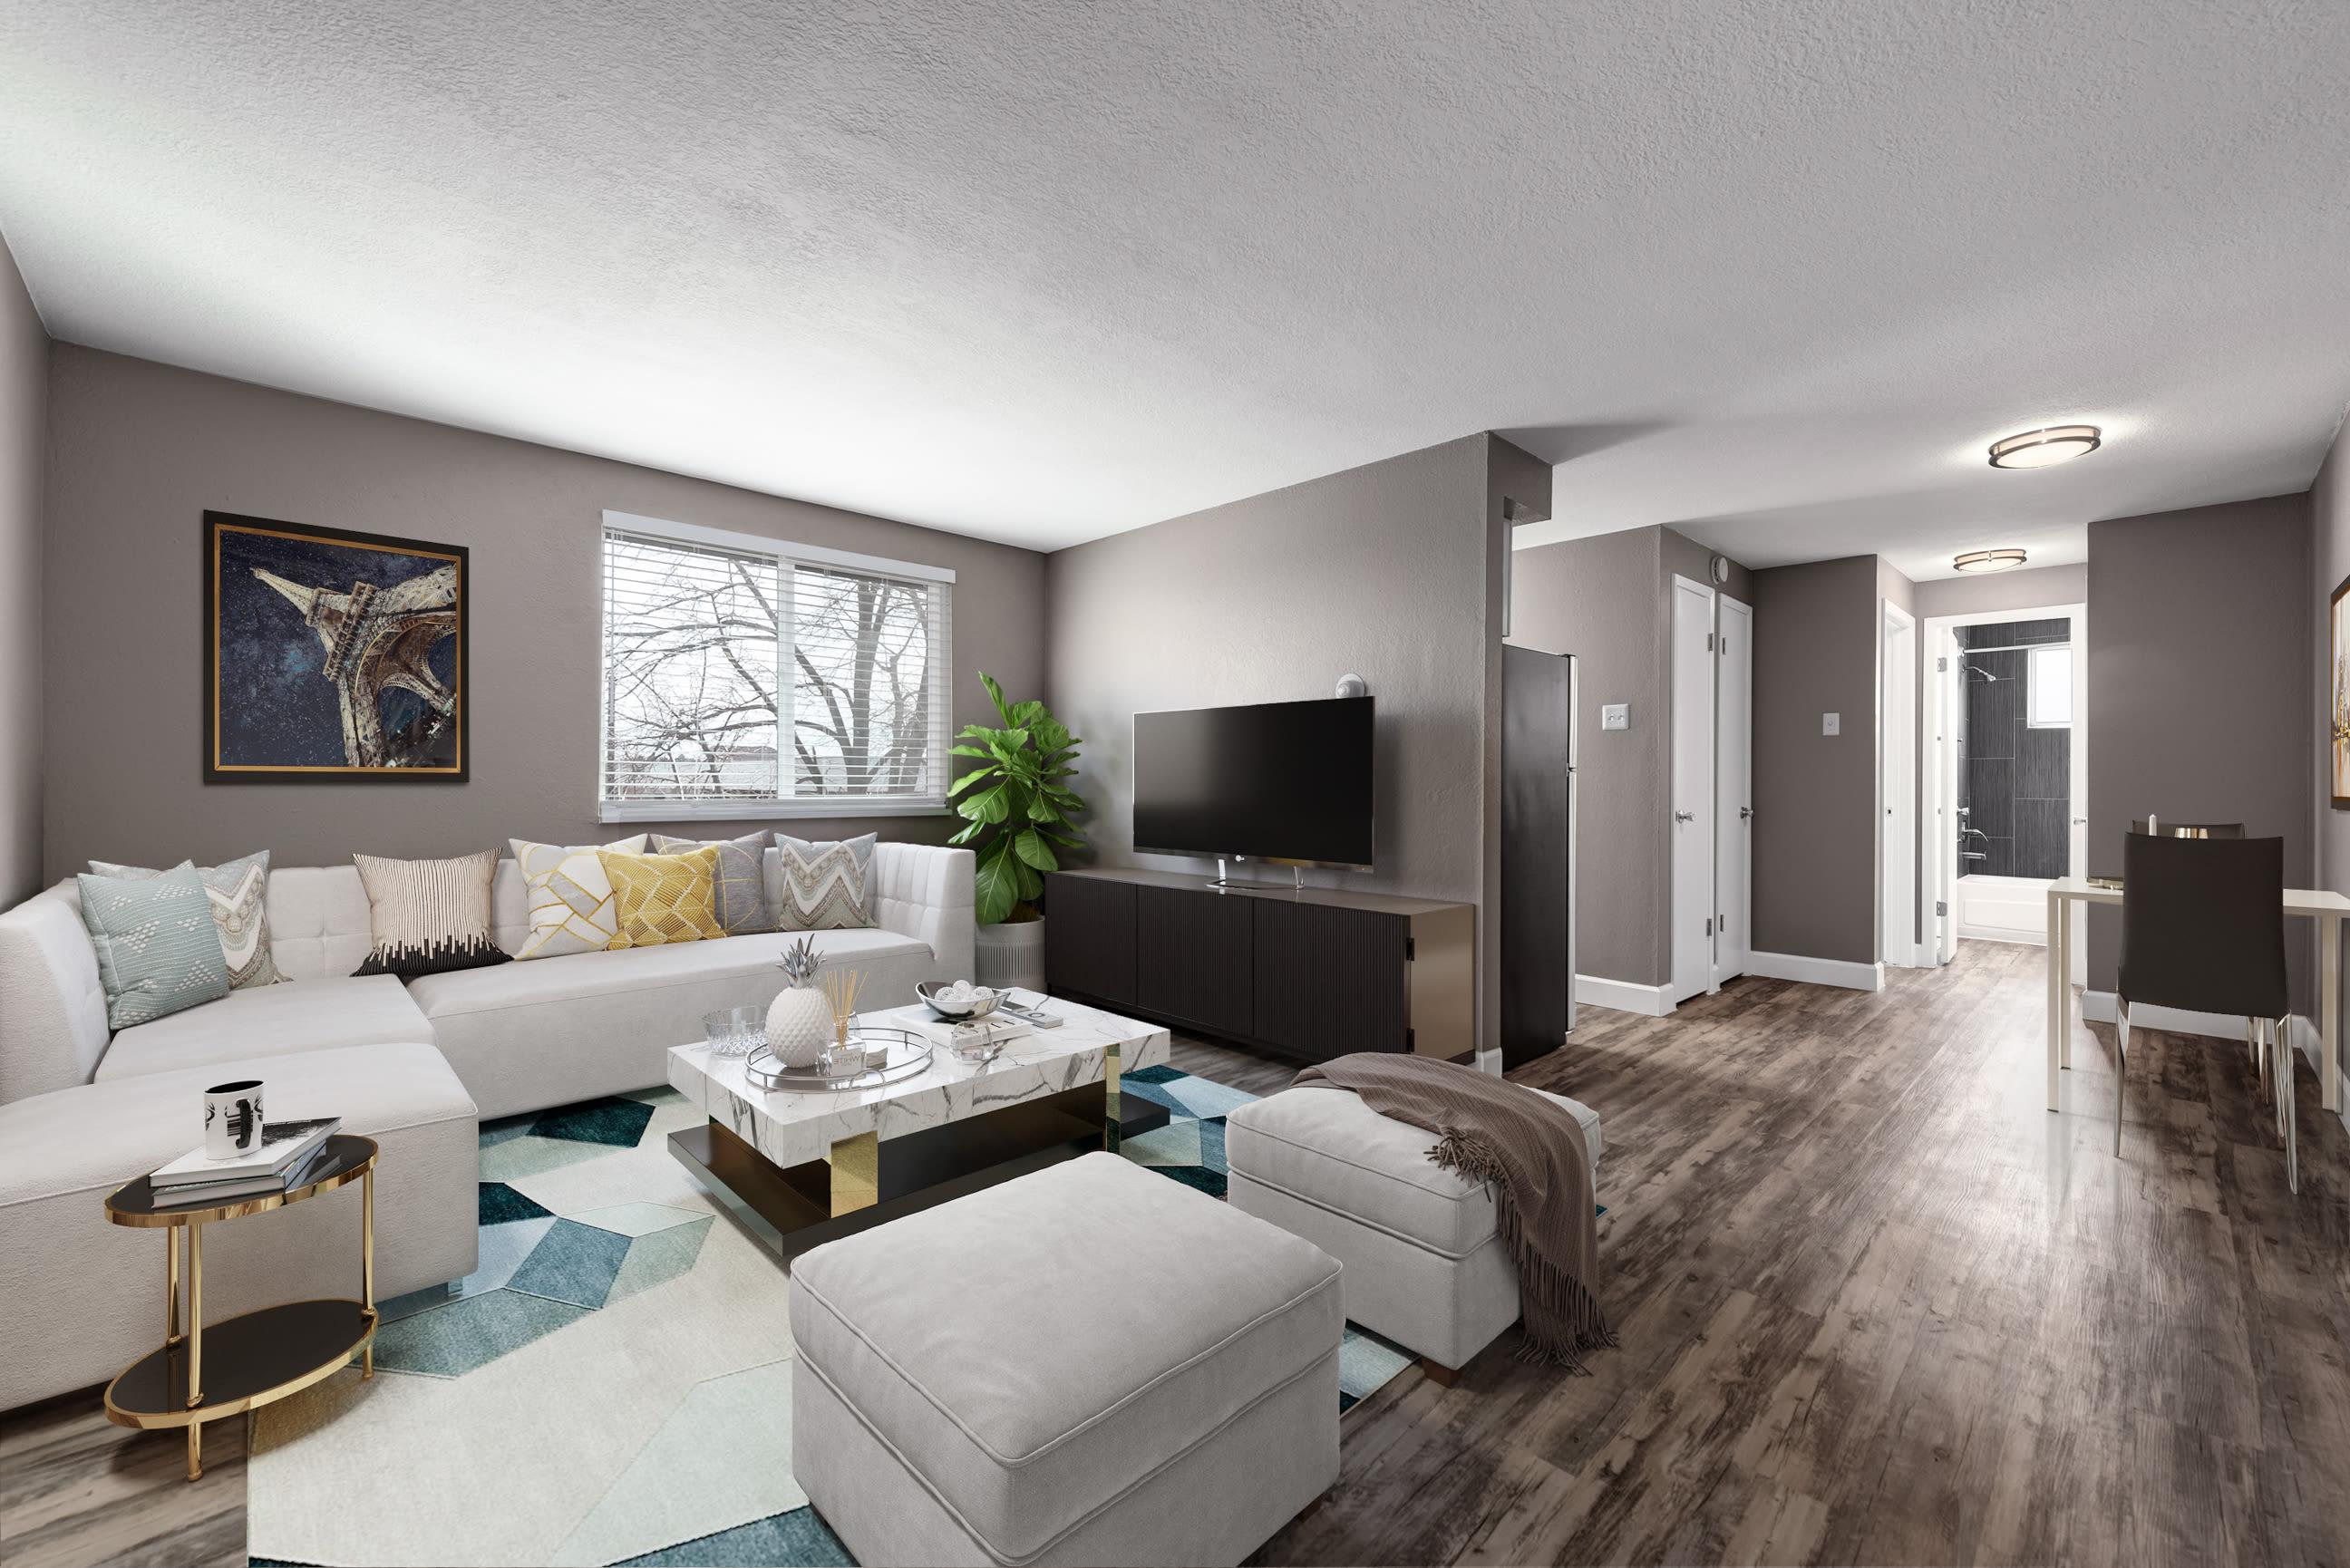 Model living room at Southglenn Place in Centennial, Colorado